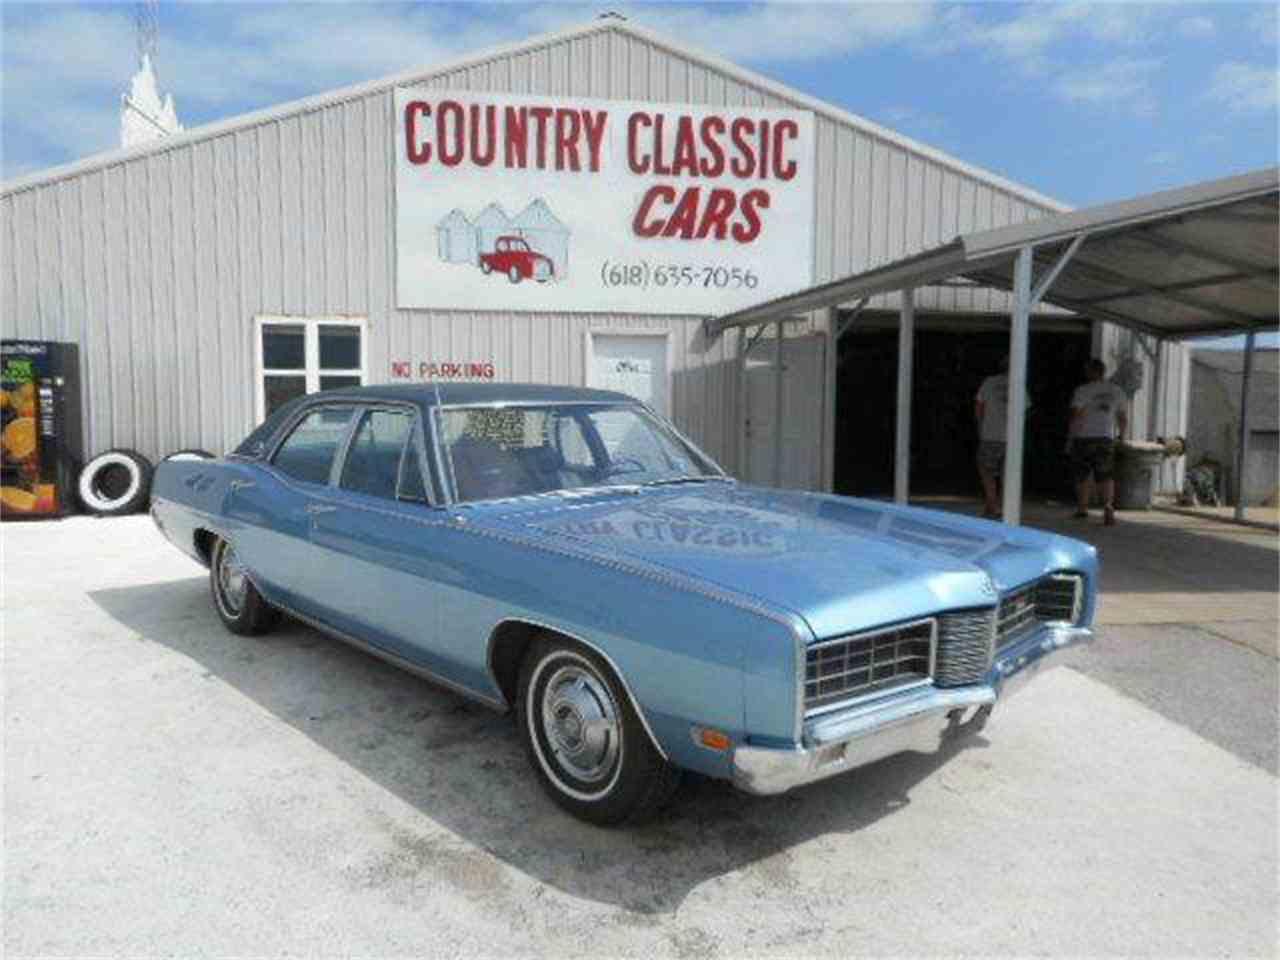 Classic Ford LTD for Sale on ClassicCars.com - Pg 2